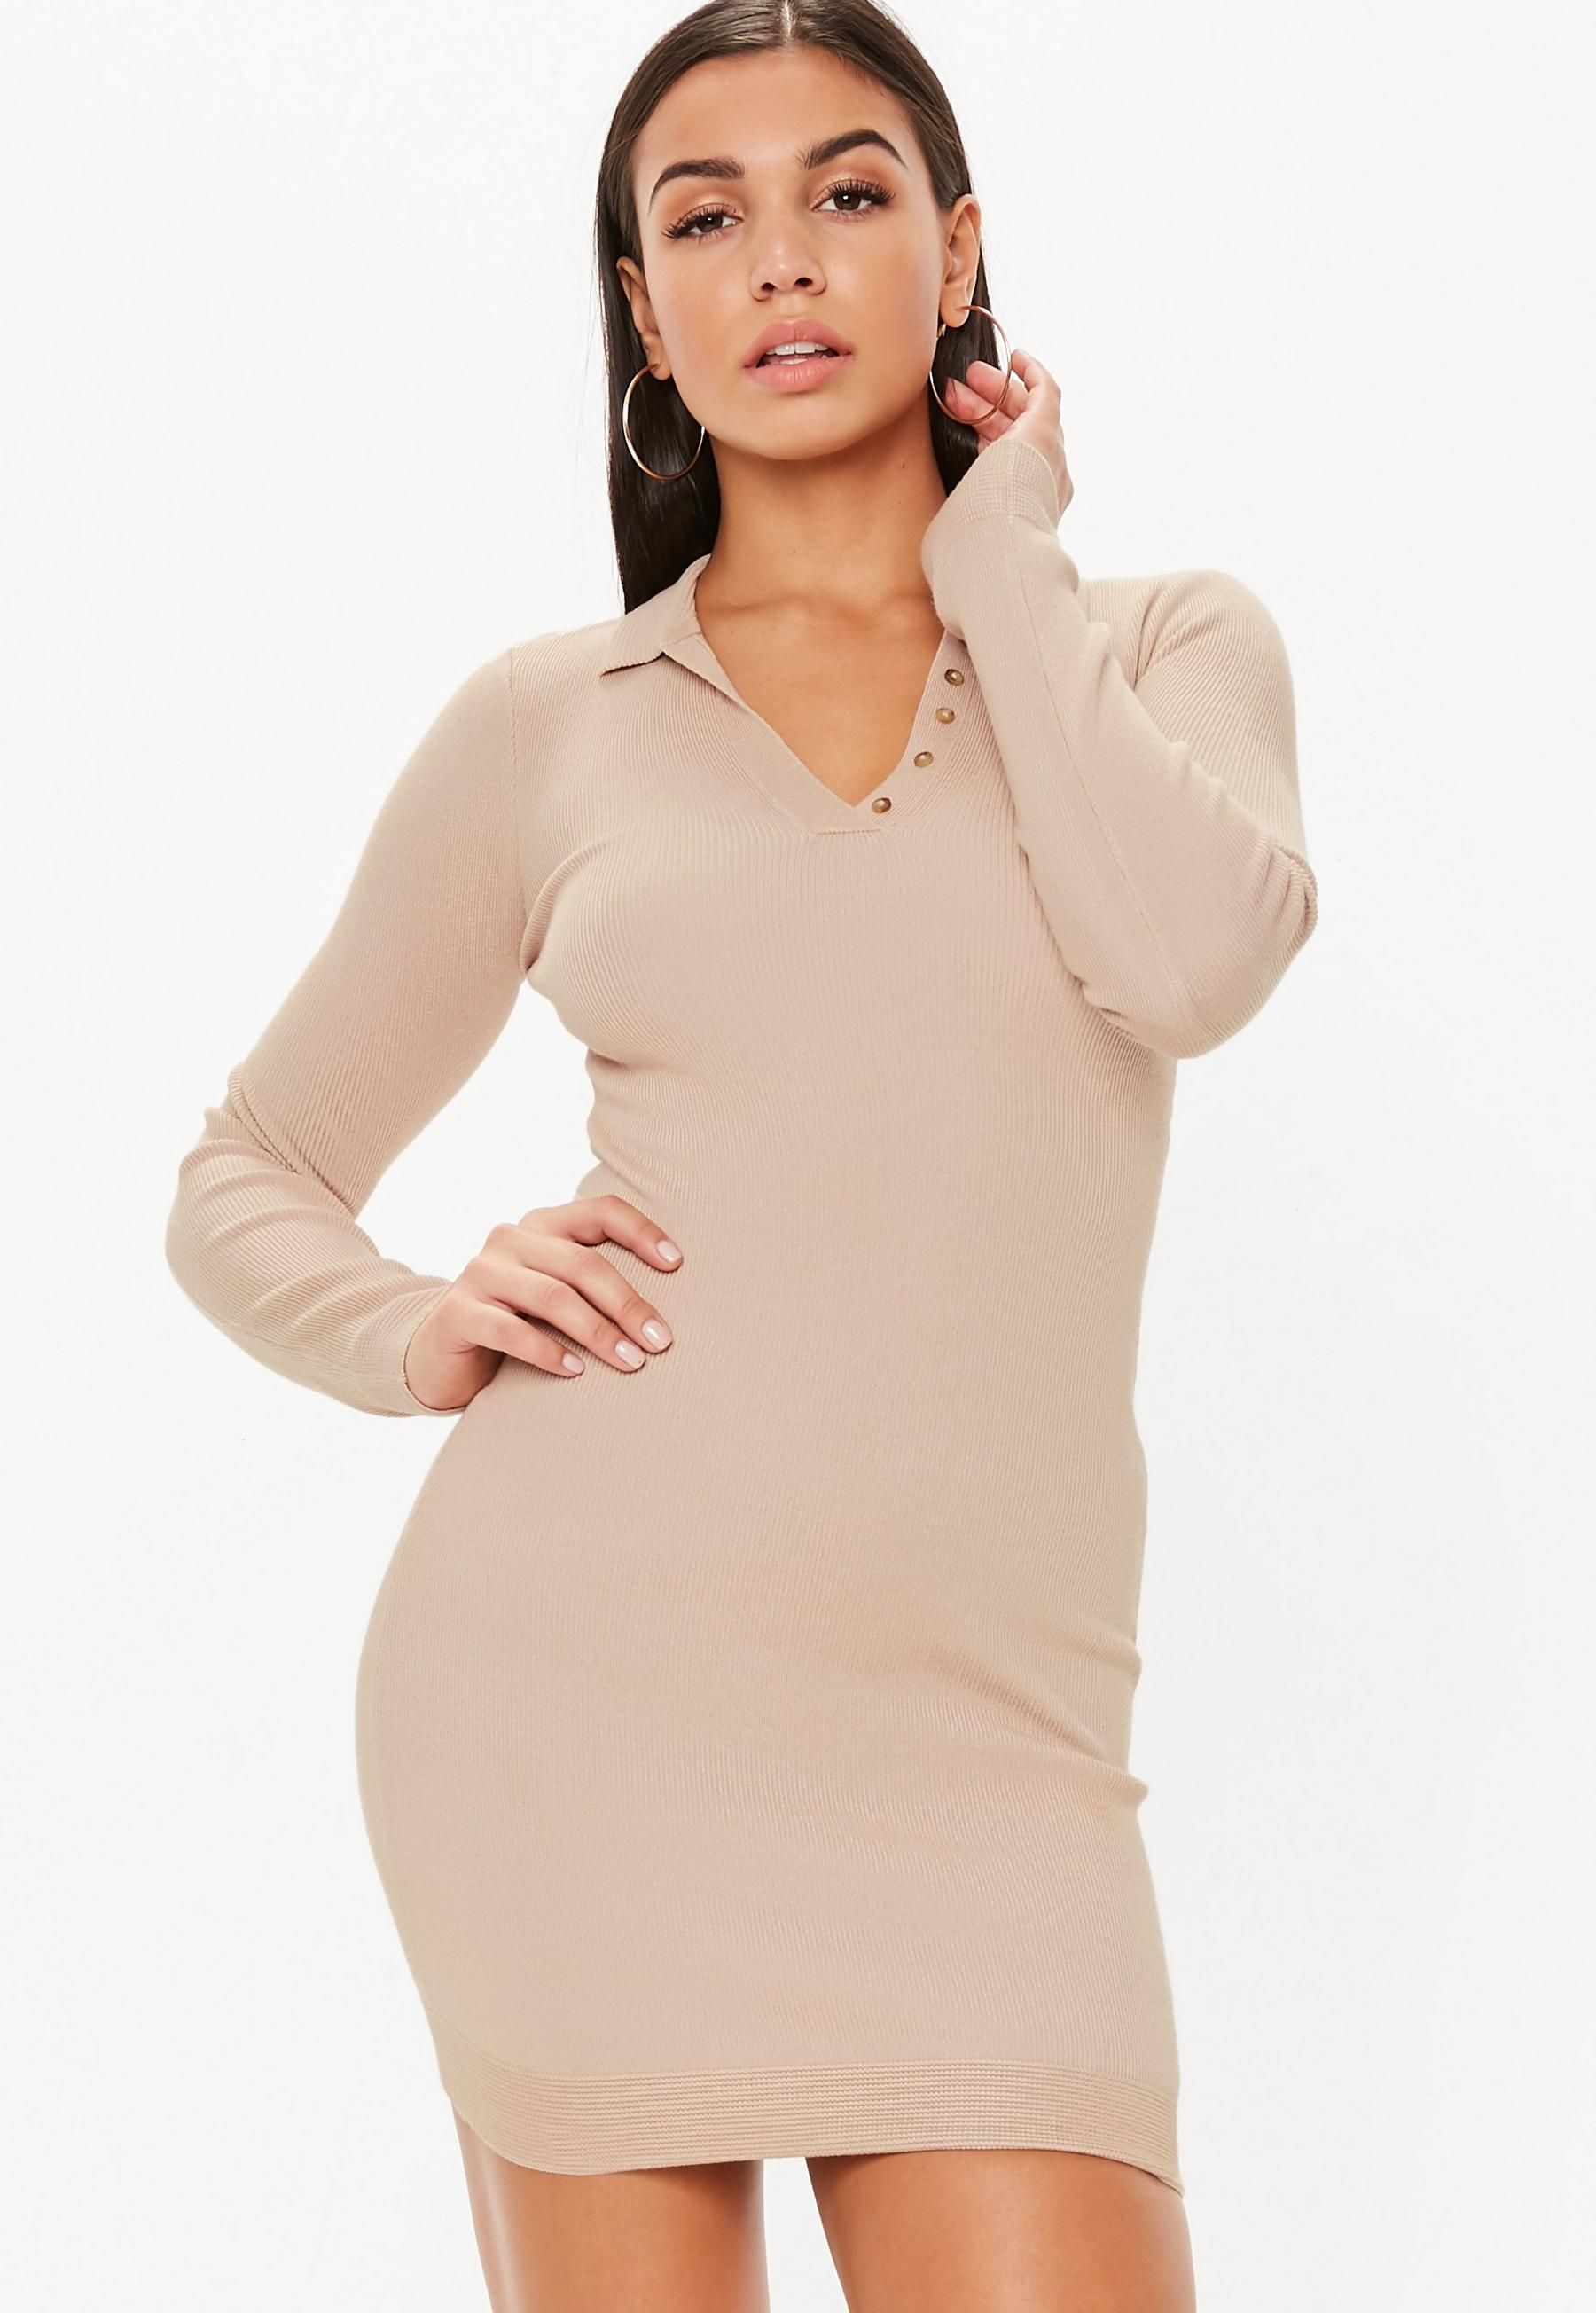 Tan Button Collar Long Sleeve Knitted Mini Dress Missguided Knit Mini Dress Mini Dress Sweaters For Women [ 2608 x 1800 Pixel ]